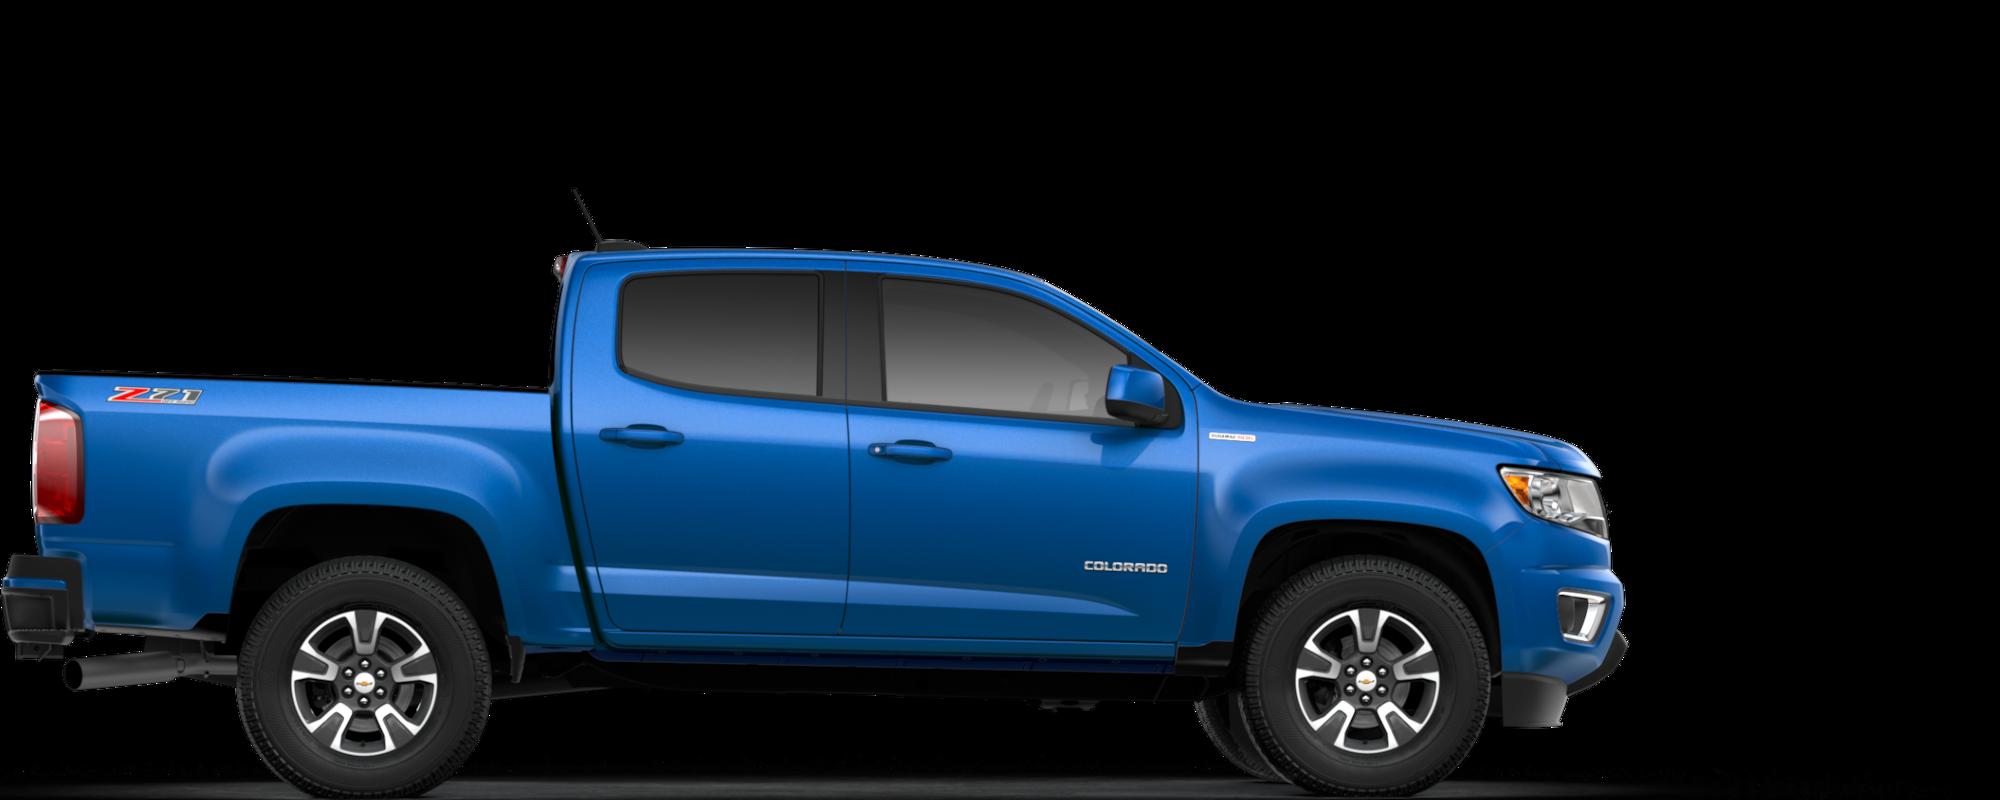 New Chevrolet Silverado 2500hd Sacramento >> 2018 Chevrolet Colorado for sale near Sacramento | John L Sullivan Chevrolet